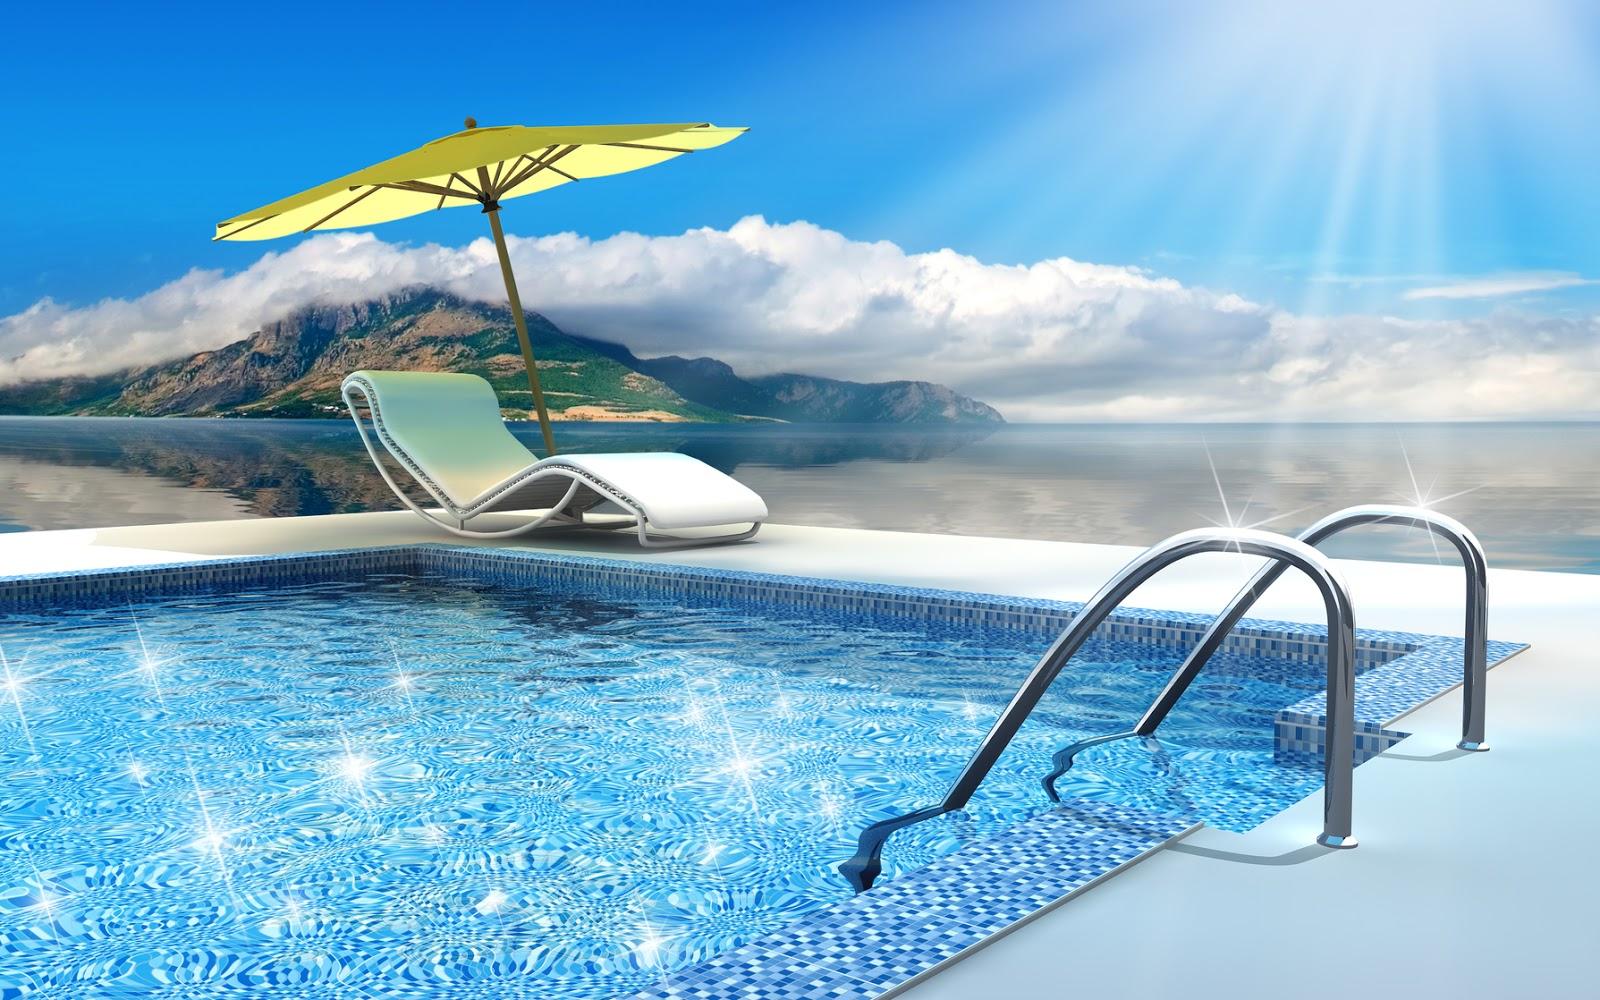 Banco de im genes 14 fotos de piscinas o albercas para for Fotos de piscinas climatizadas